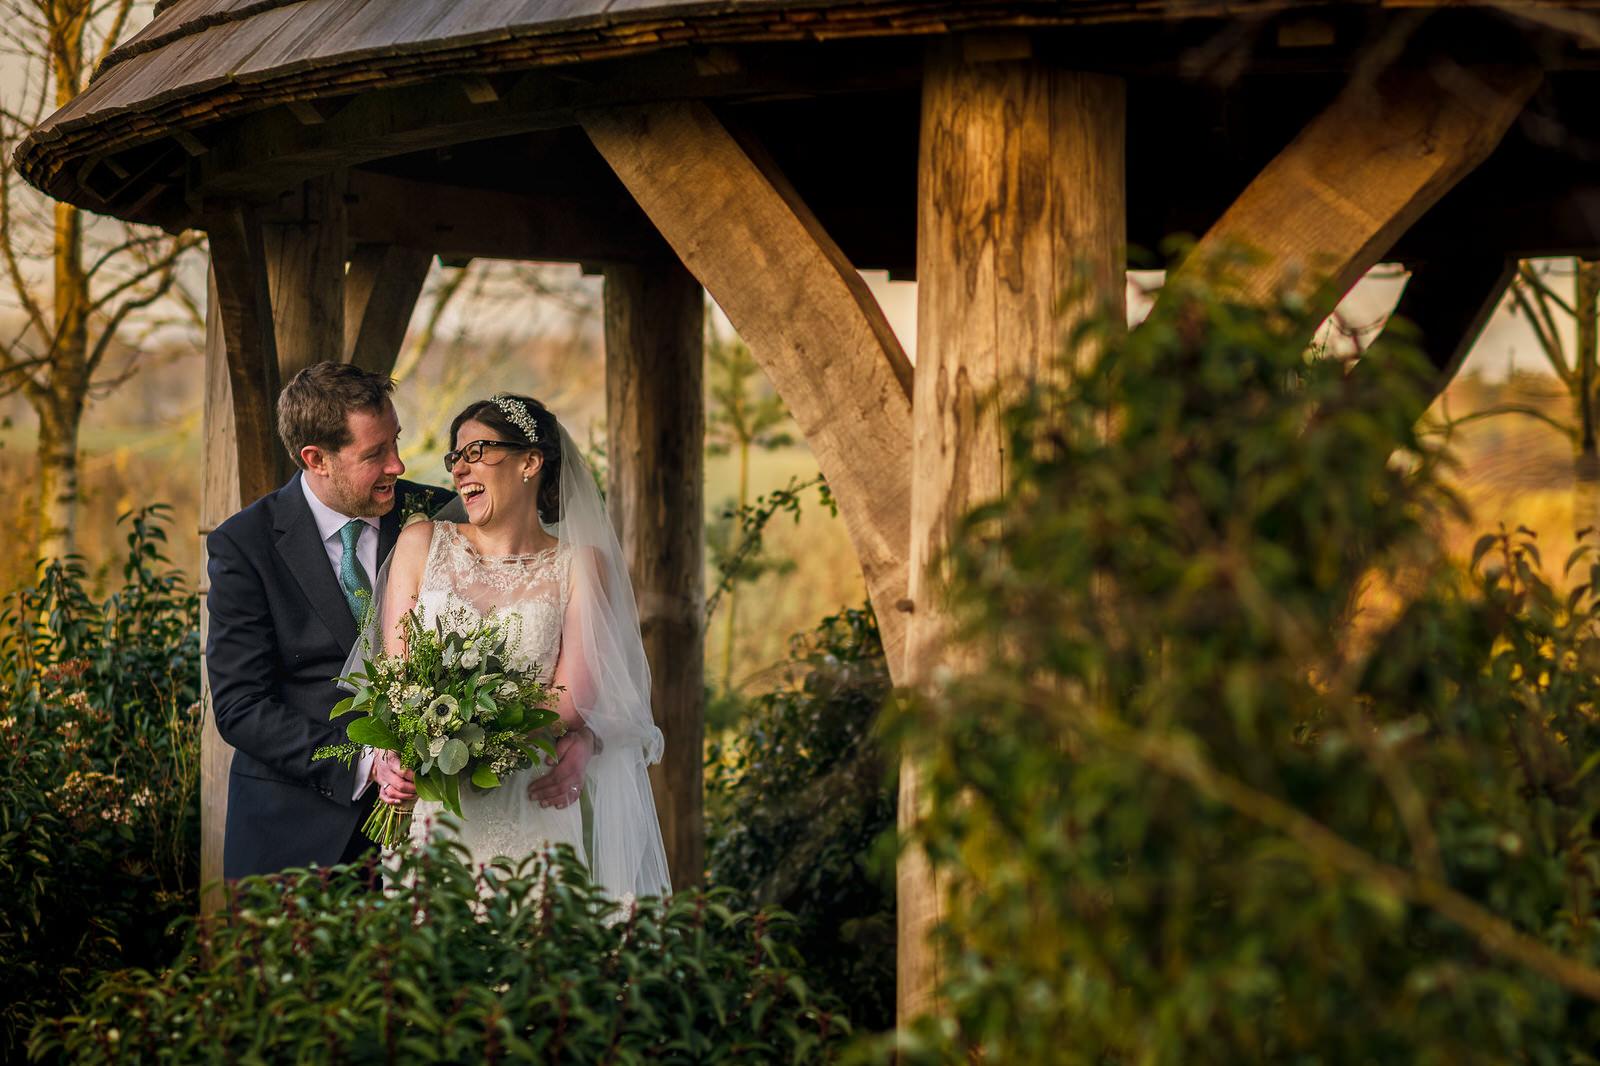 dan_morris_photography-311stone+barn+cotswold+wedding+venue.jpg